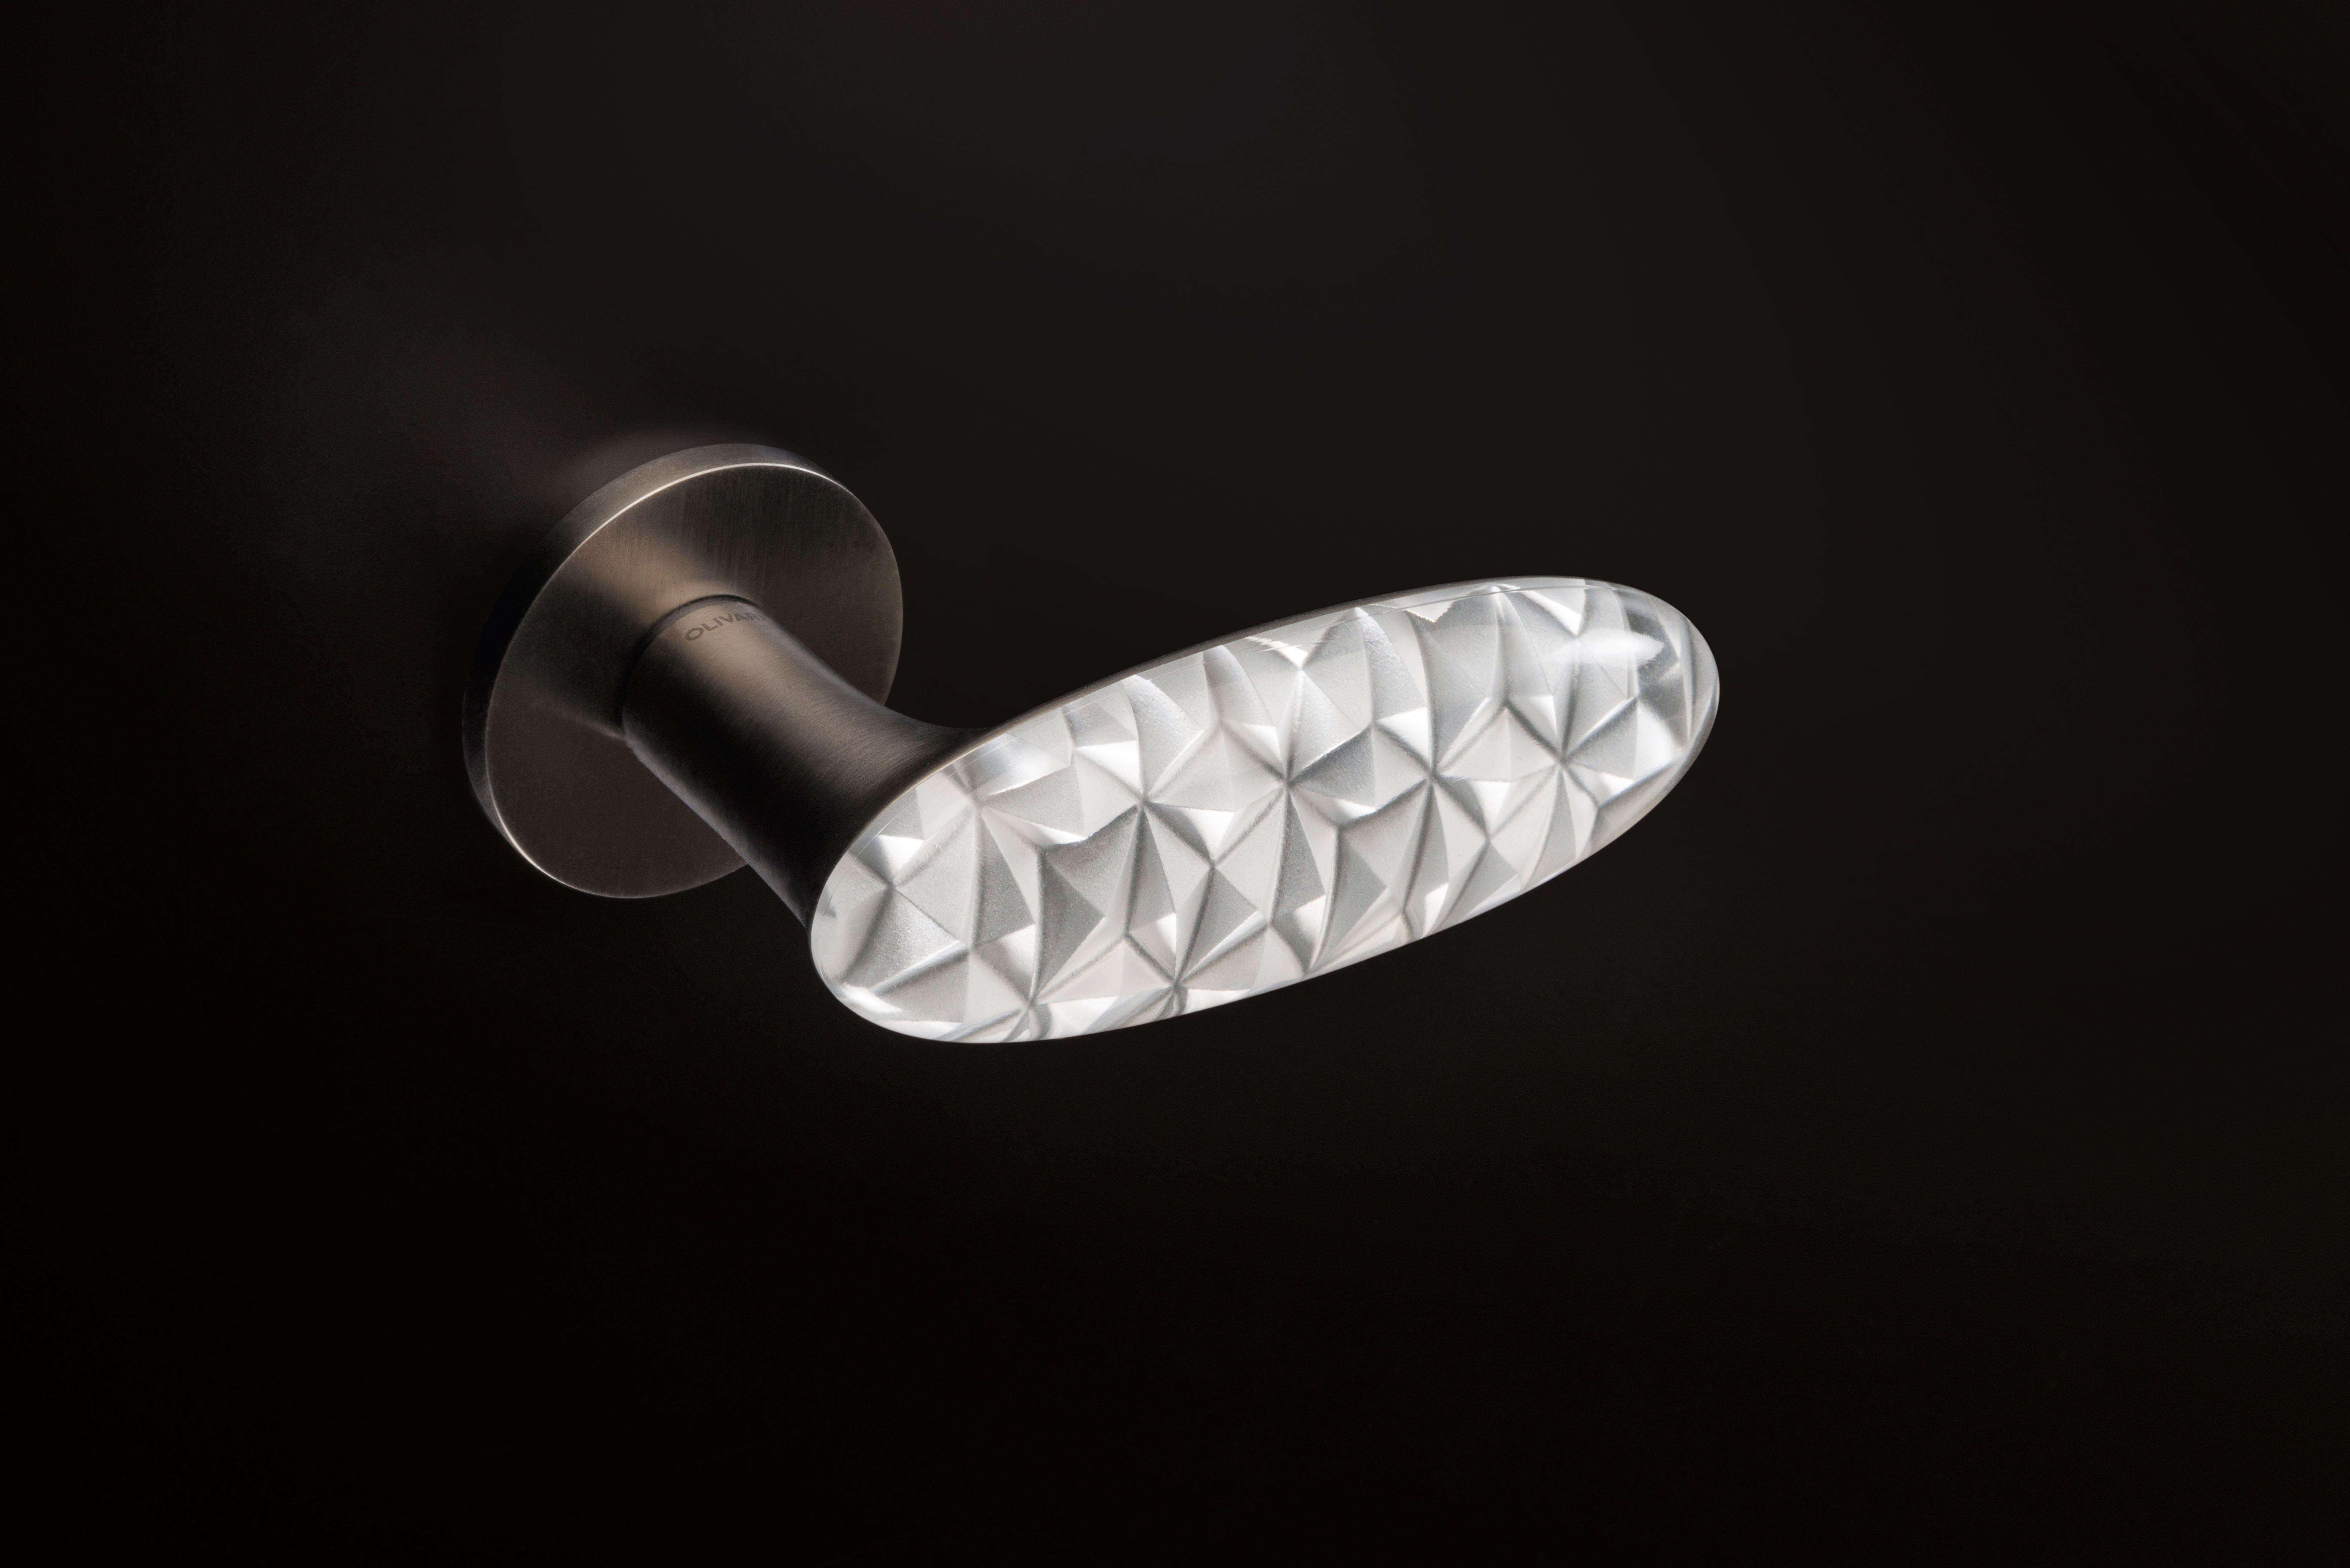 door lasmaneta engaging handles leather uk handballtunisie l glass co cabinet crystal org and swarovski